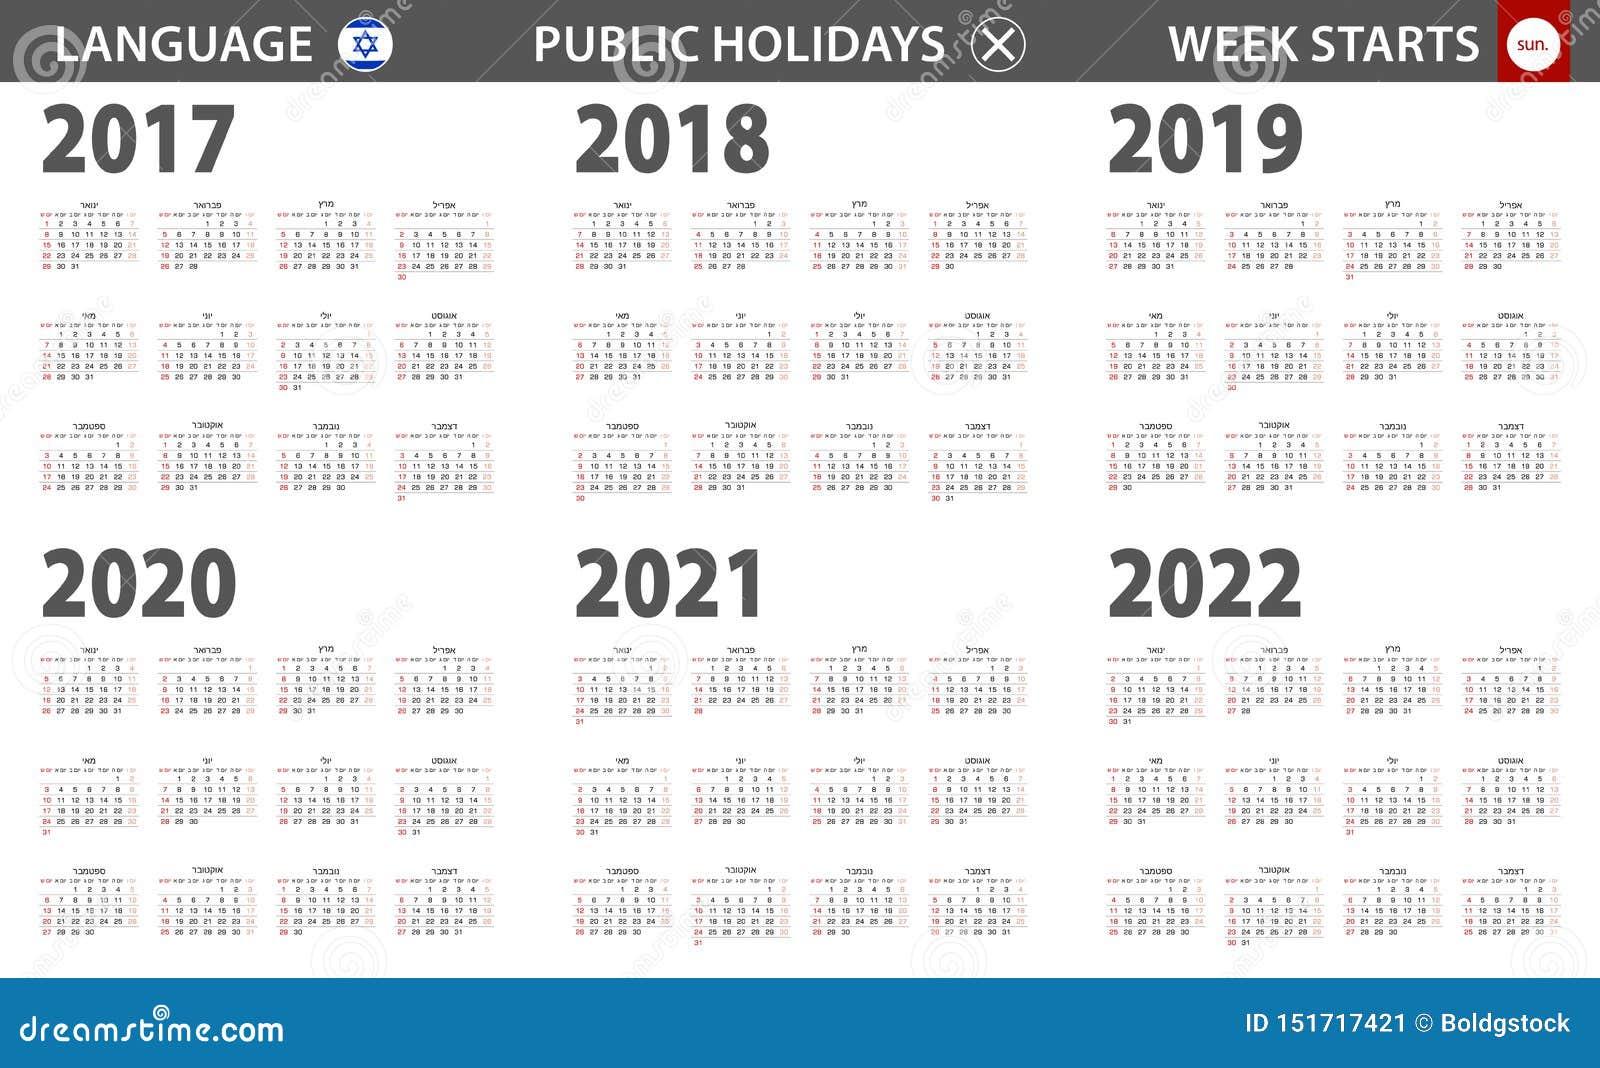 2017-2022 year calendar in Hebrew language, week starts from Sunday